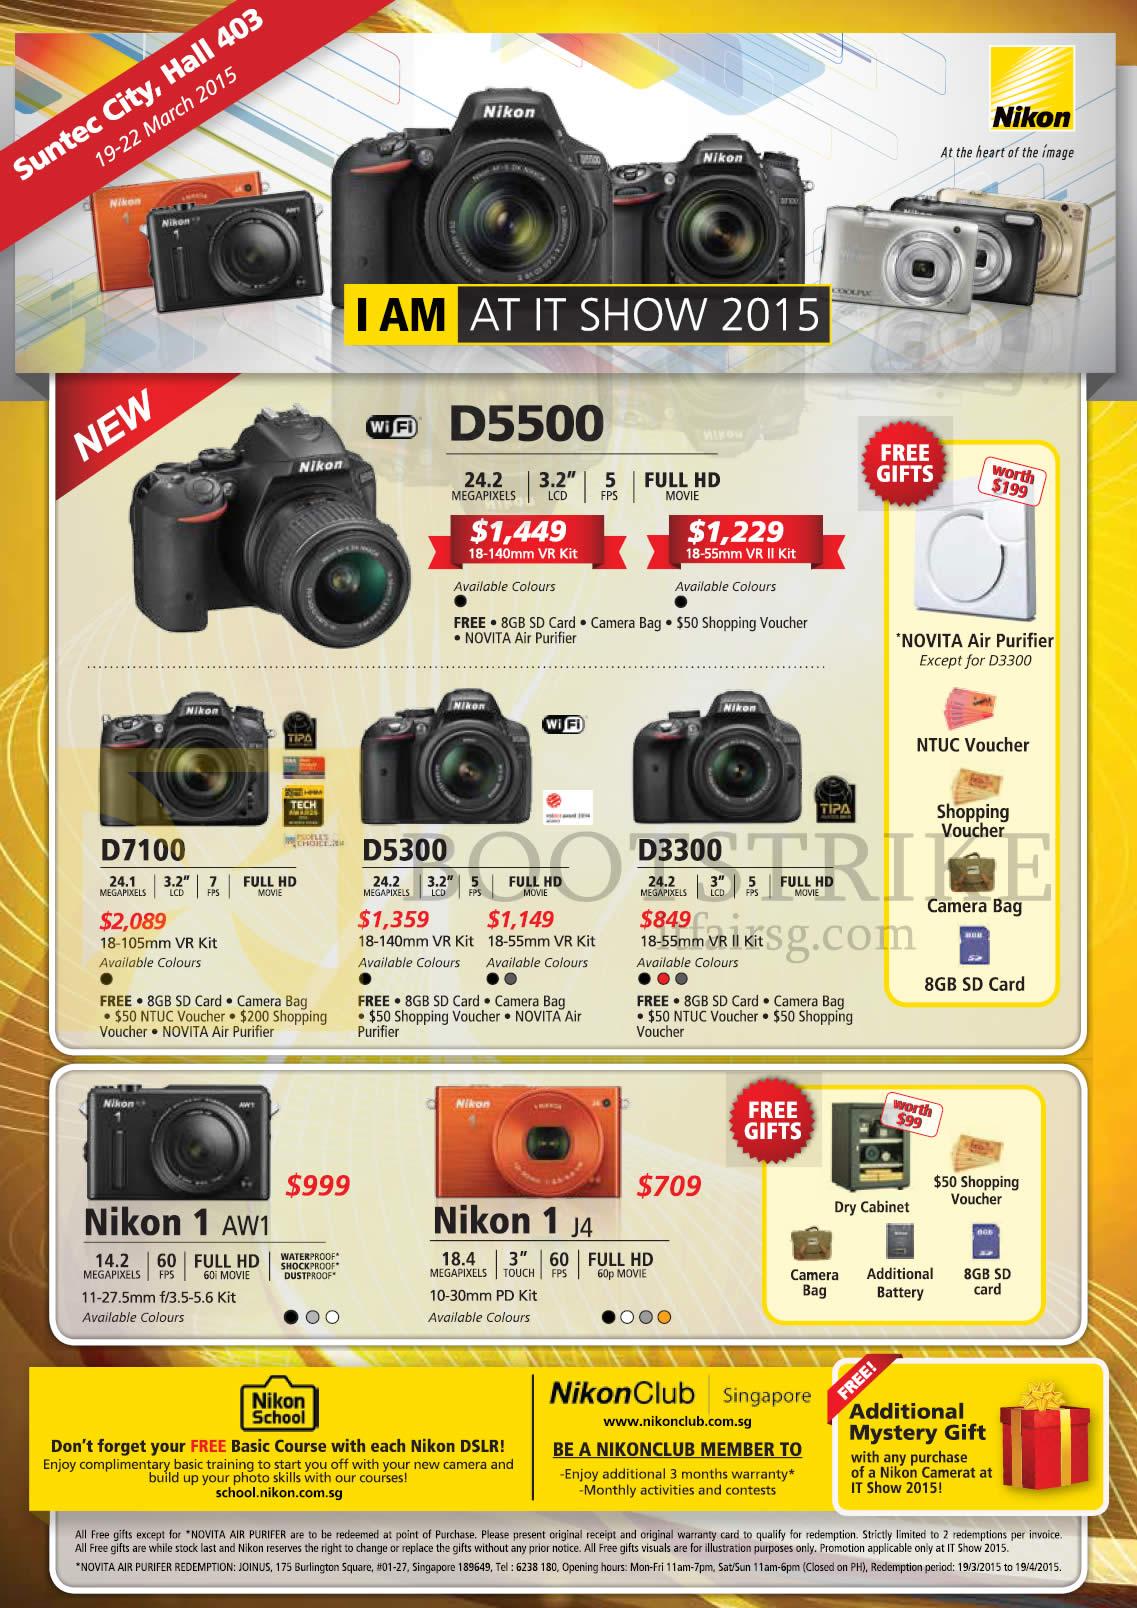 Camera Camera Nikon Dslr Price nikon camera deal in town prices singapore digital cameras dslr d5500 d7100 d5300 d3300 1 aw1 j4